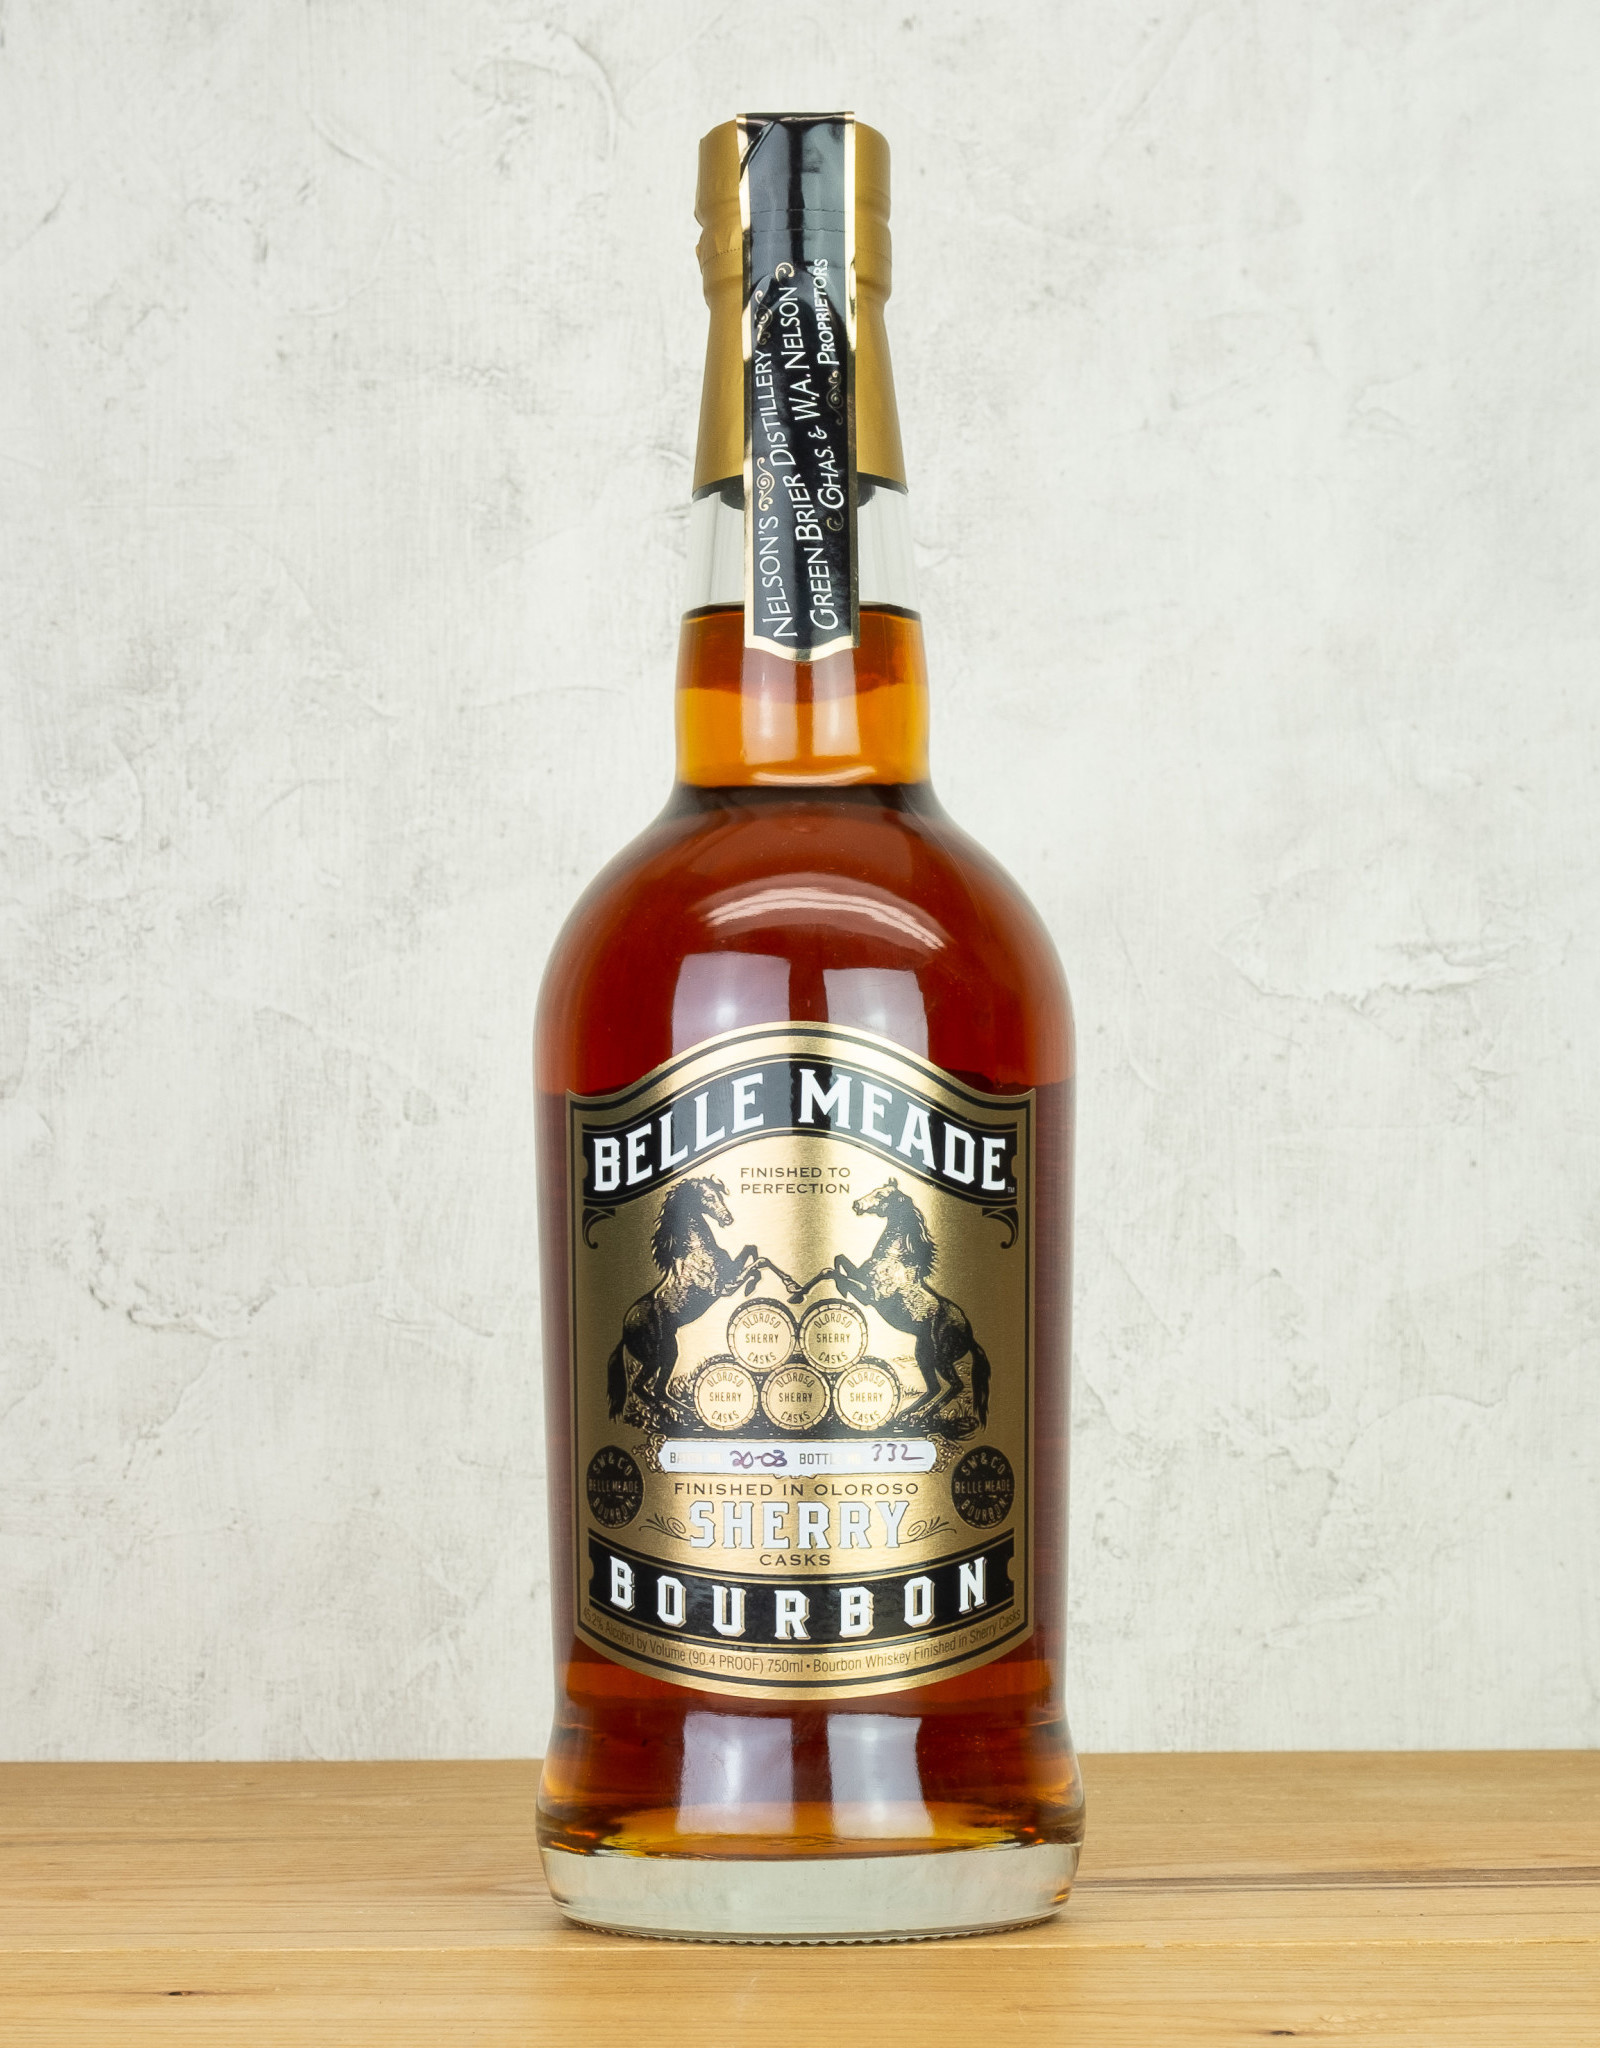 Belle Meade Bourbon Sherry Finish